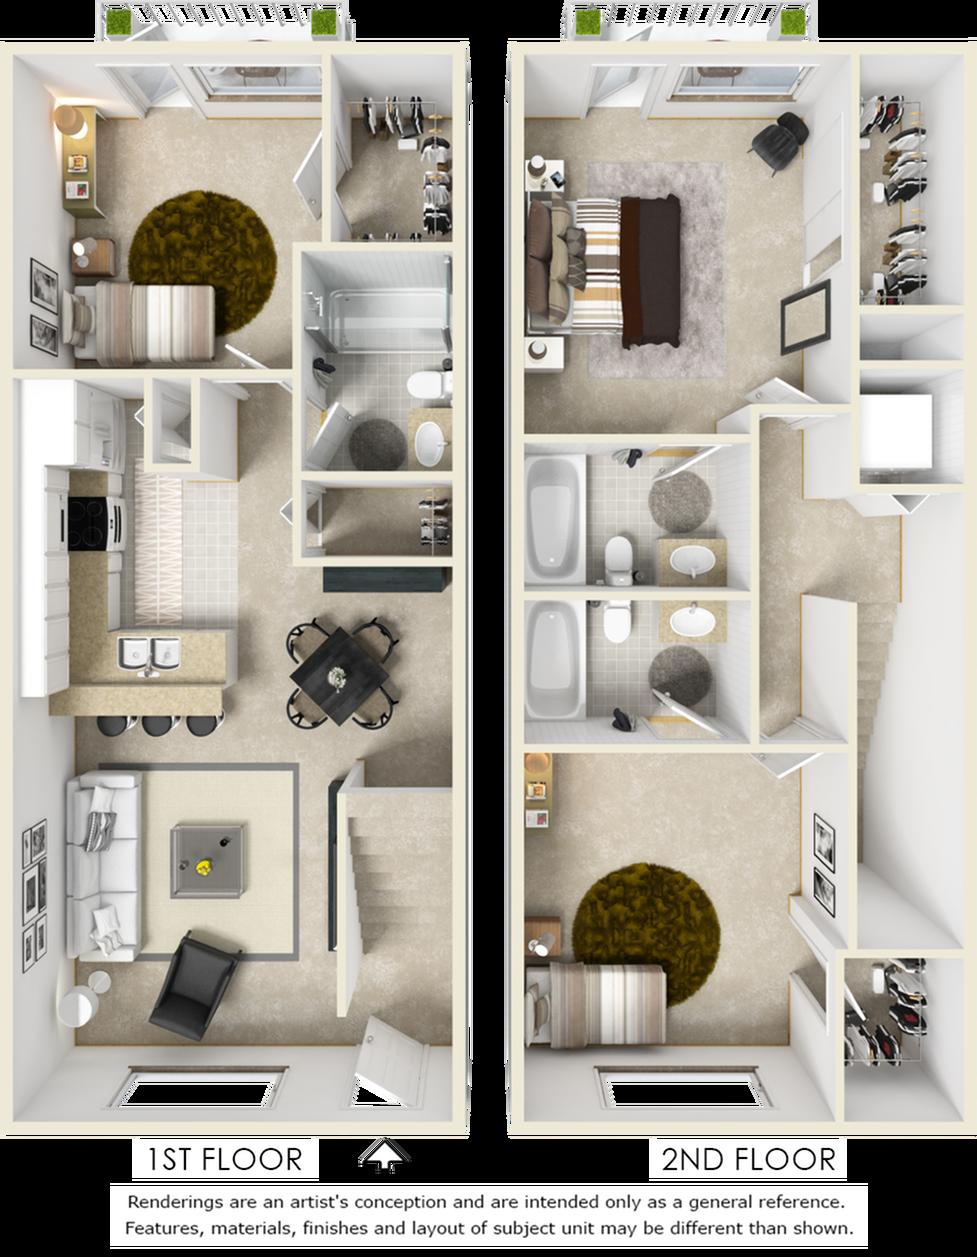 Midwood 3 bedroom 3 bathroom floor plan